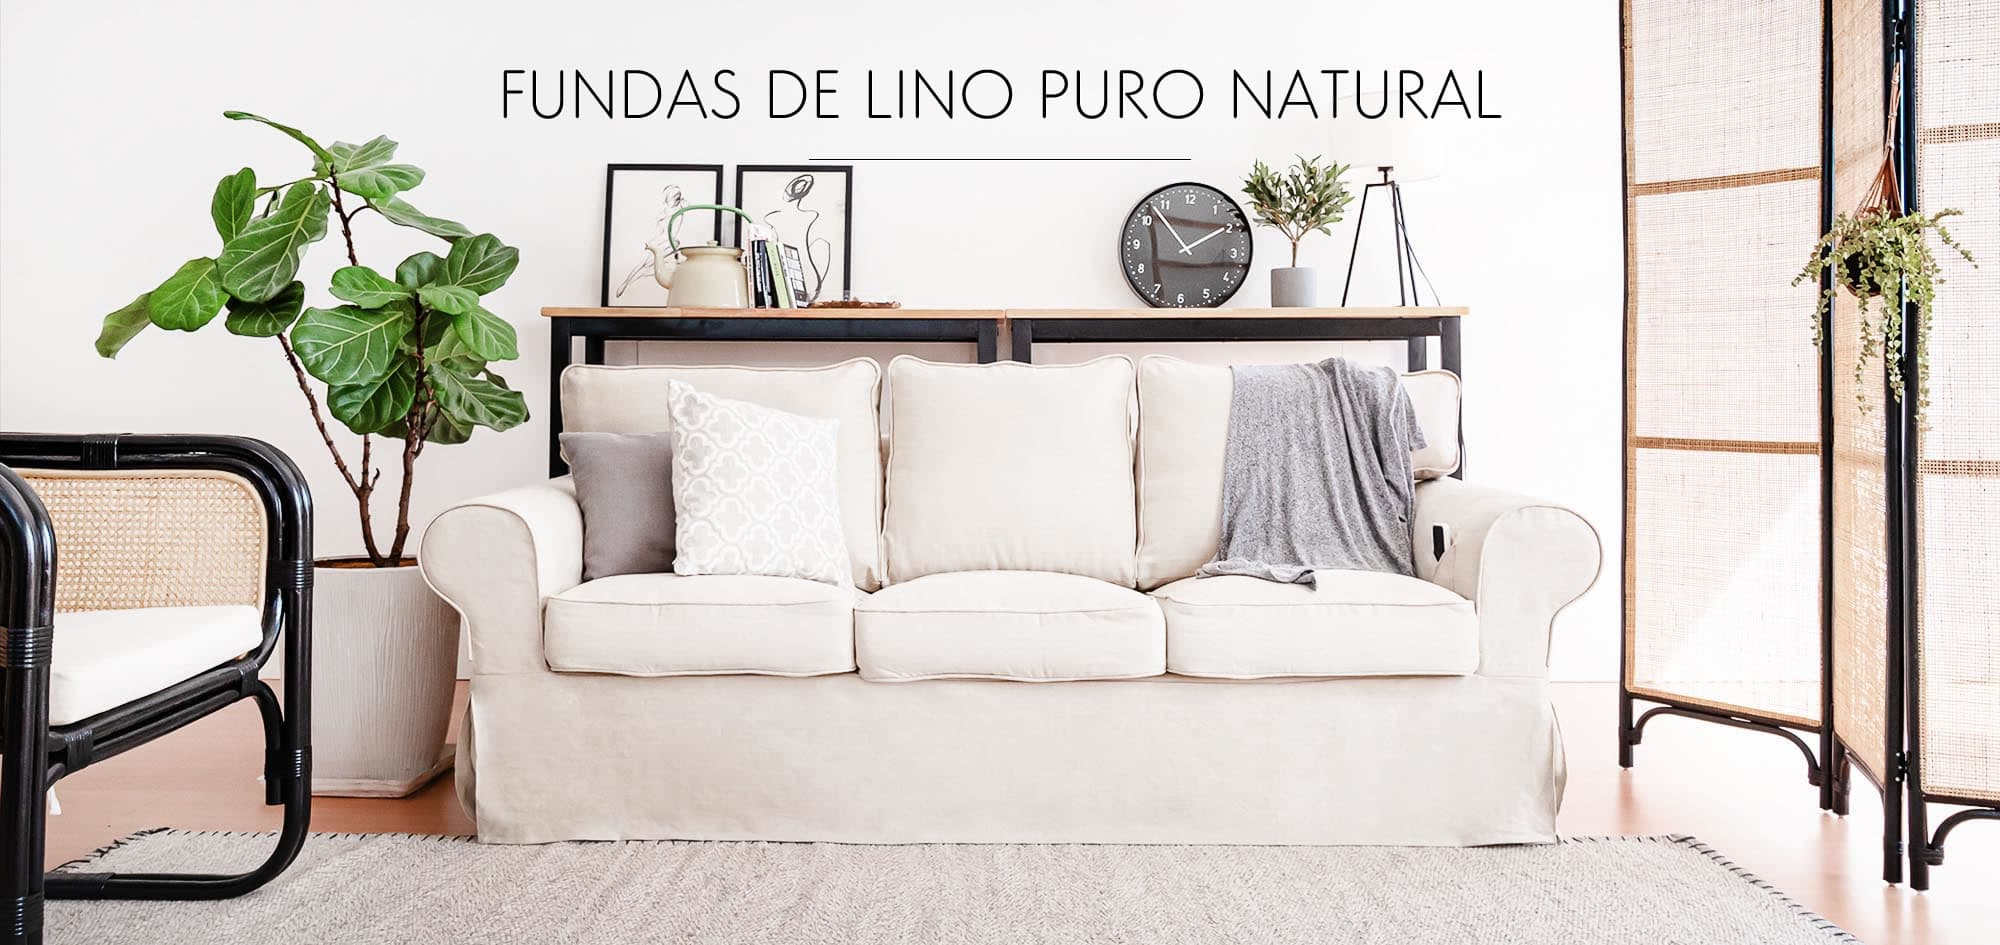 Fundas de tela de lino natural